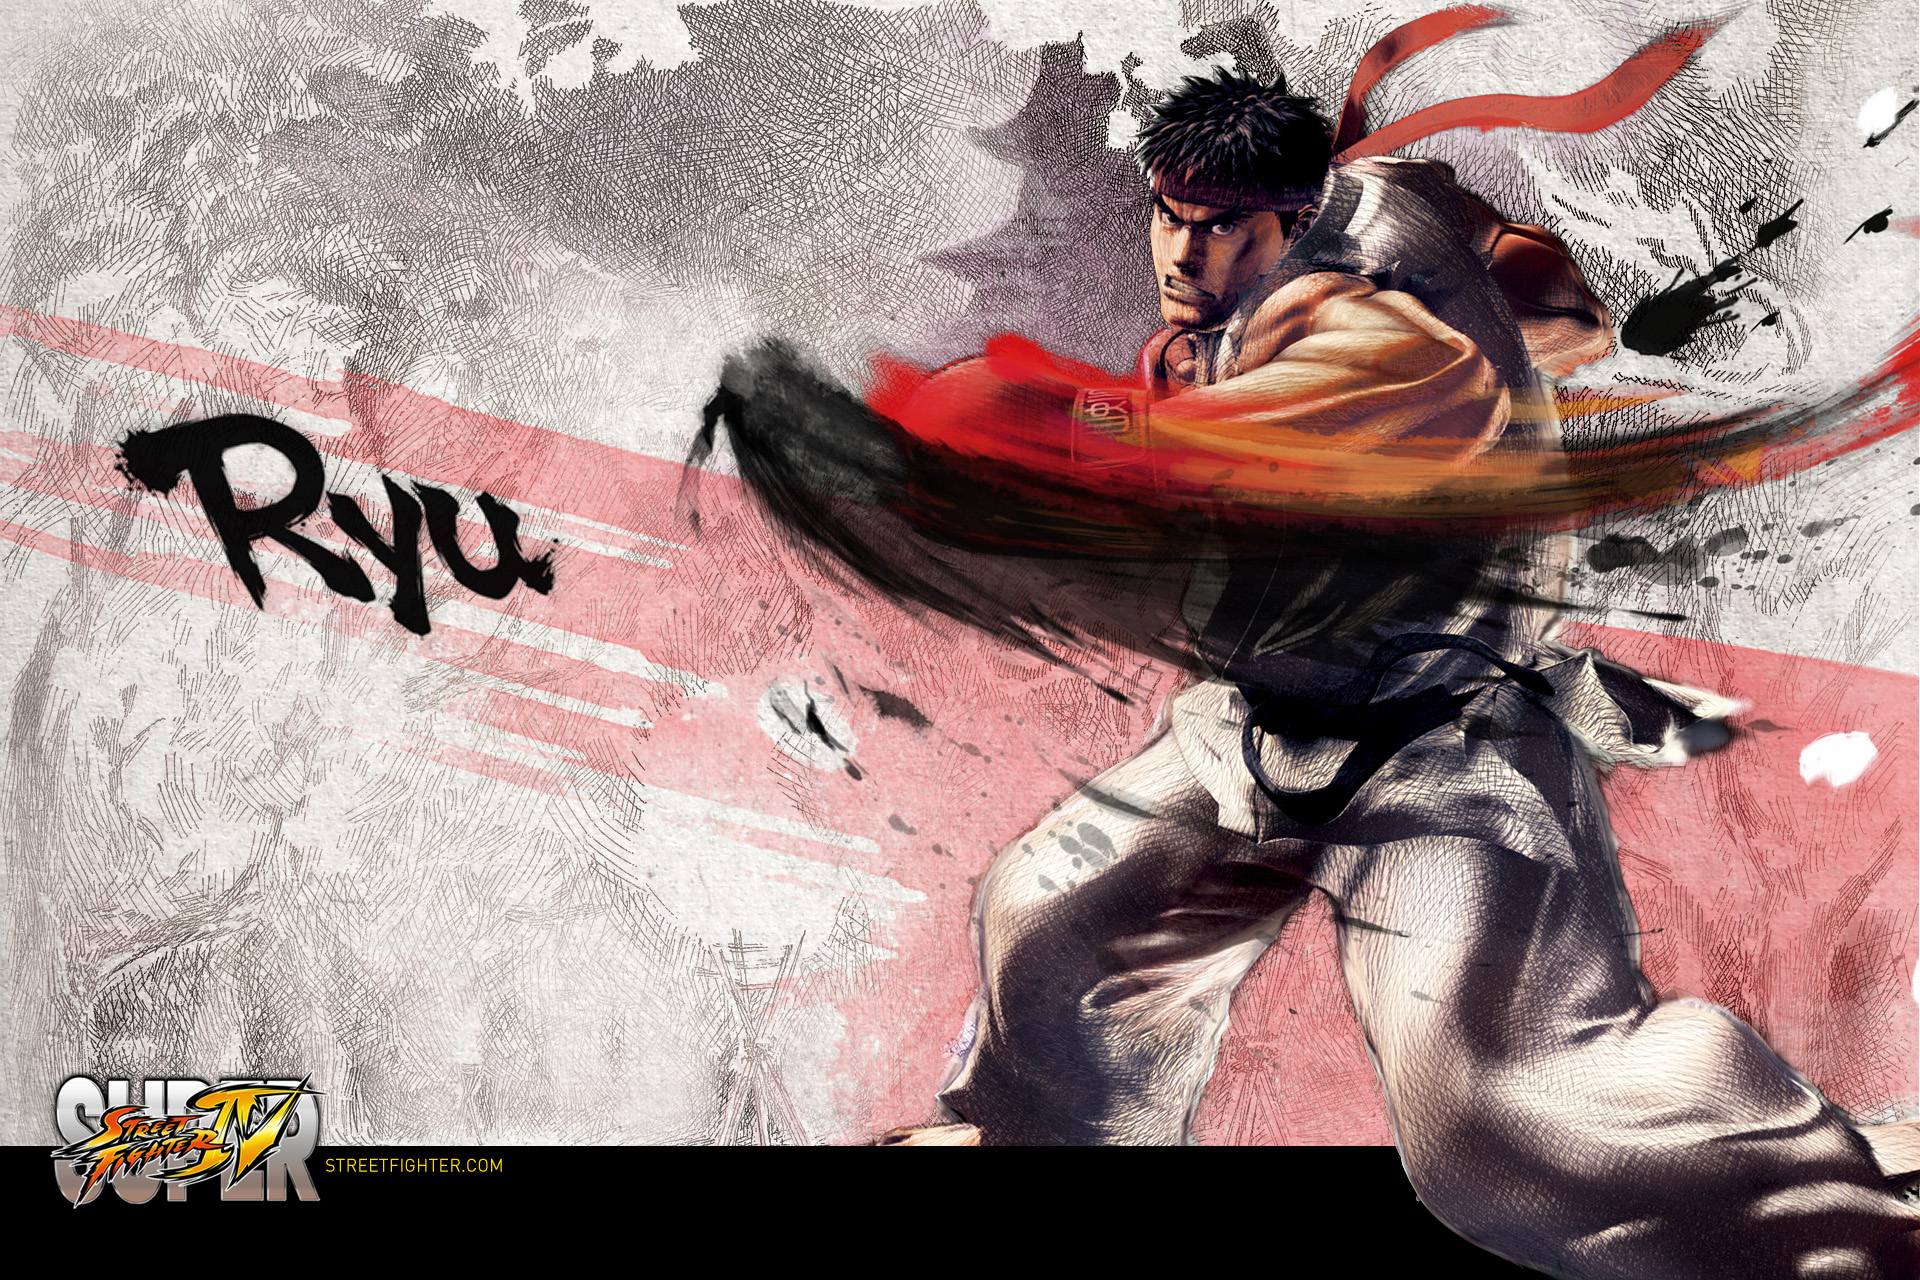 Street Fighter 5 Wallpaper: 18 Super Street Fighter IV HD Wallpapers